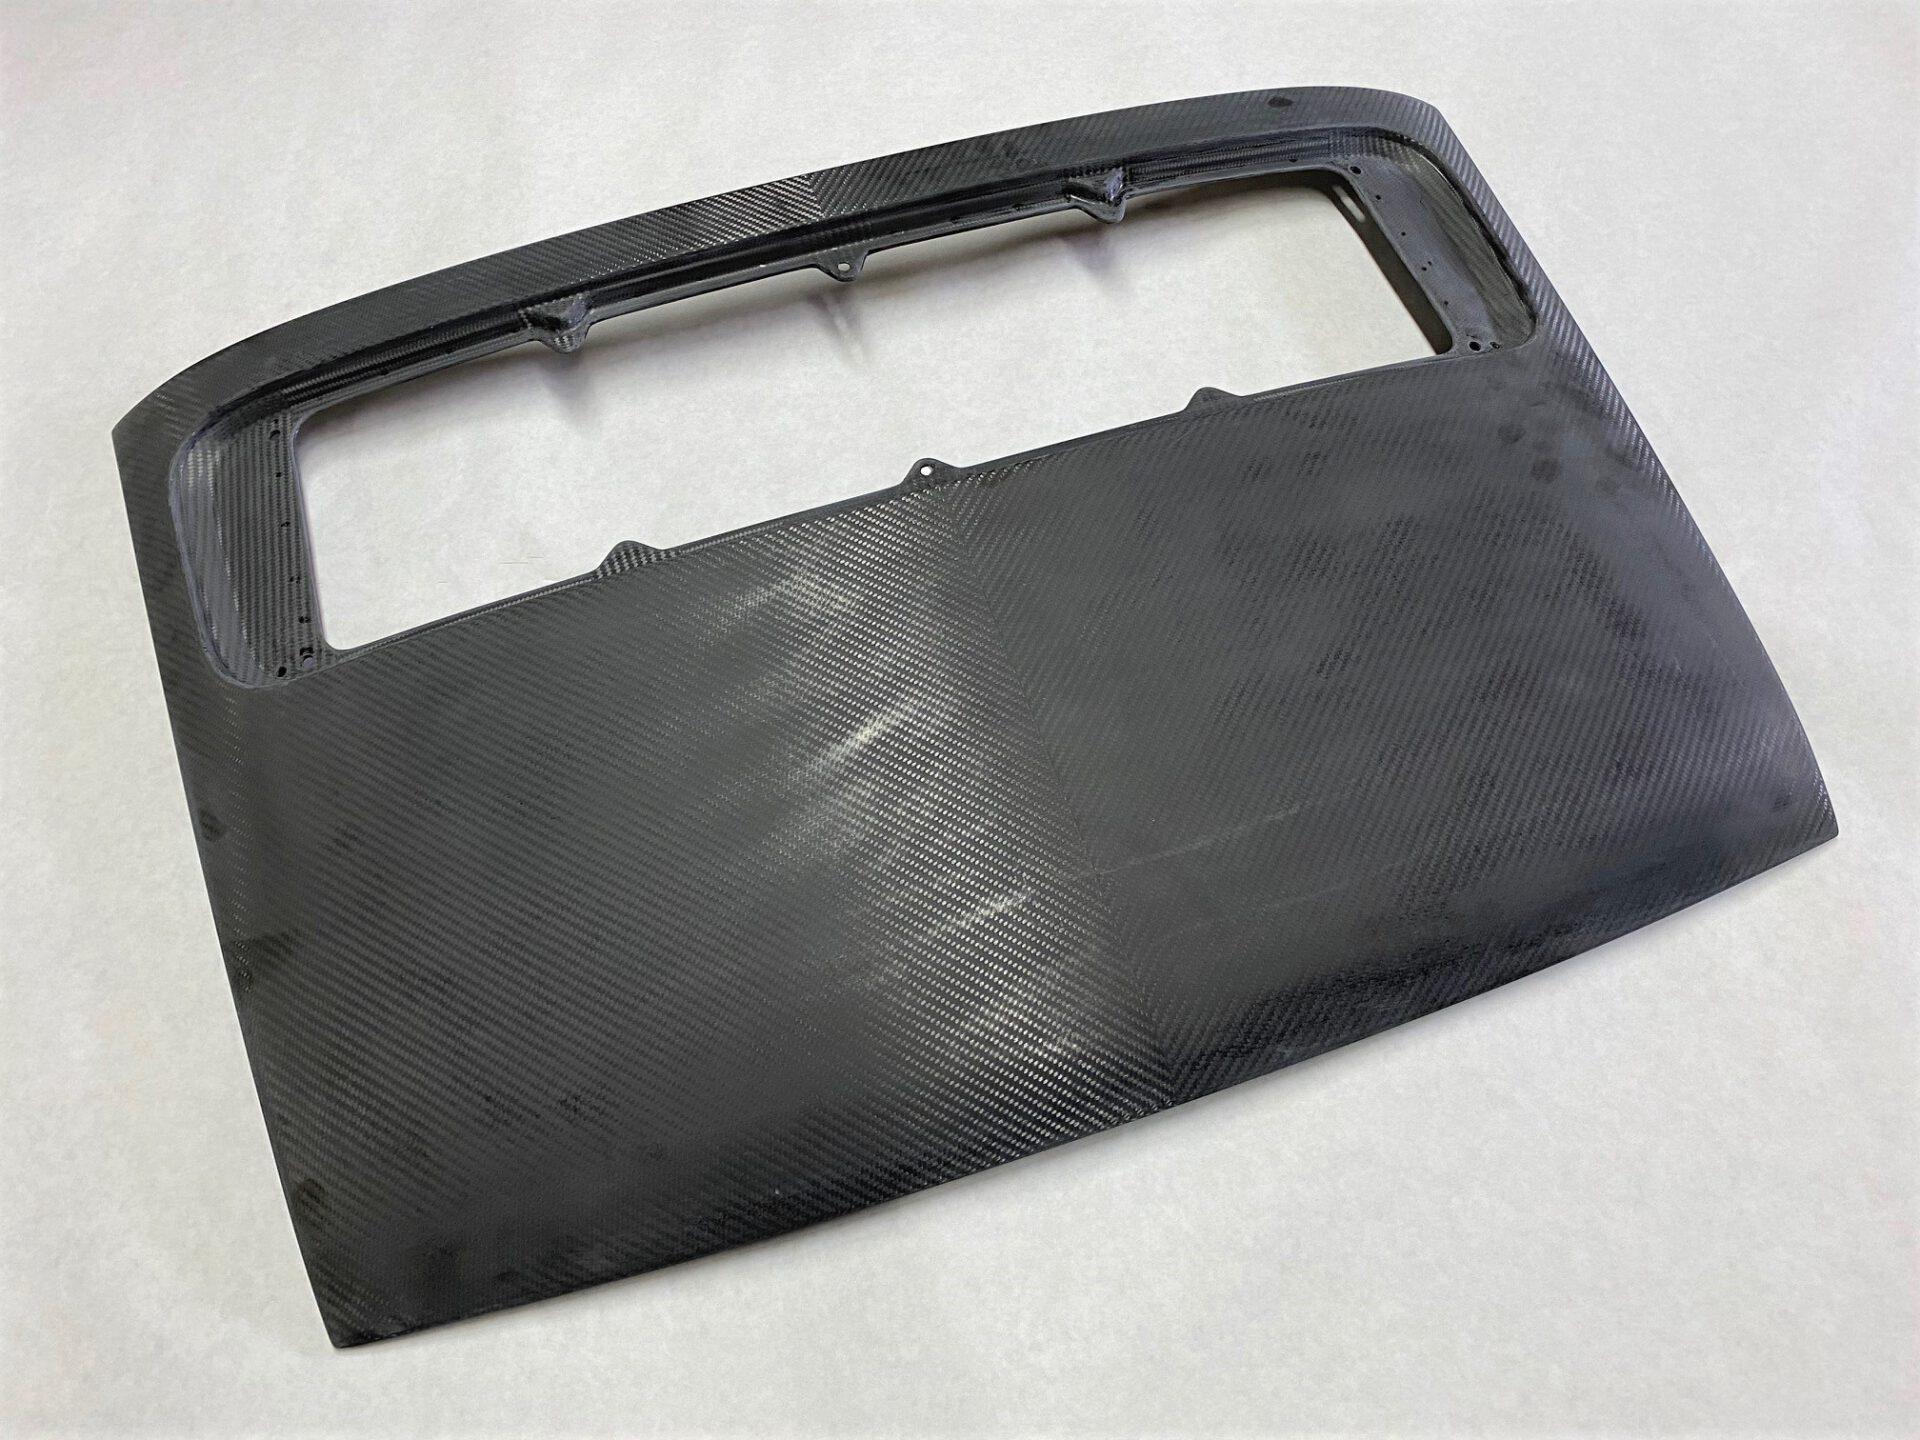 Carbon Heckdeckel Image